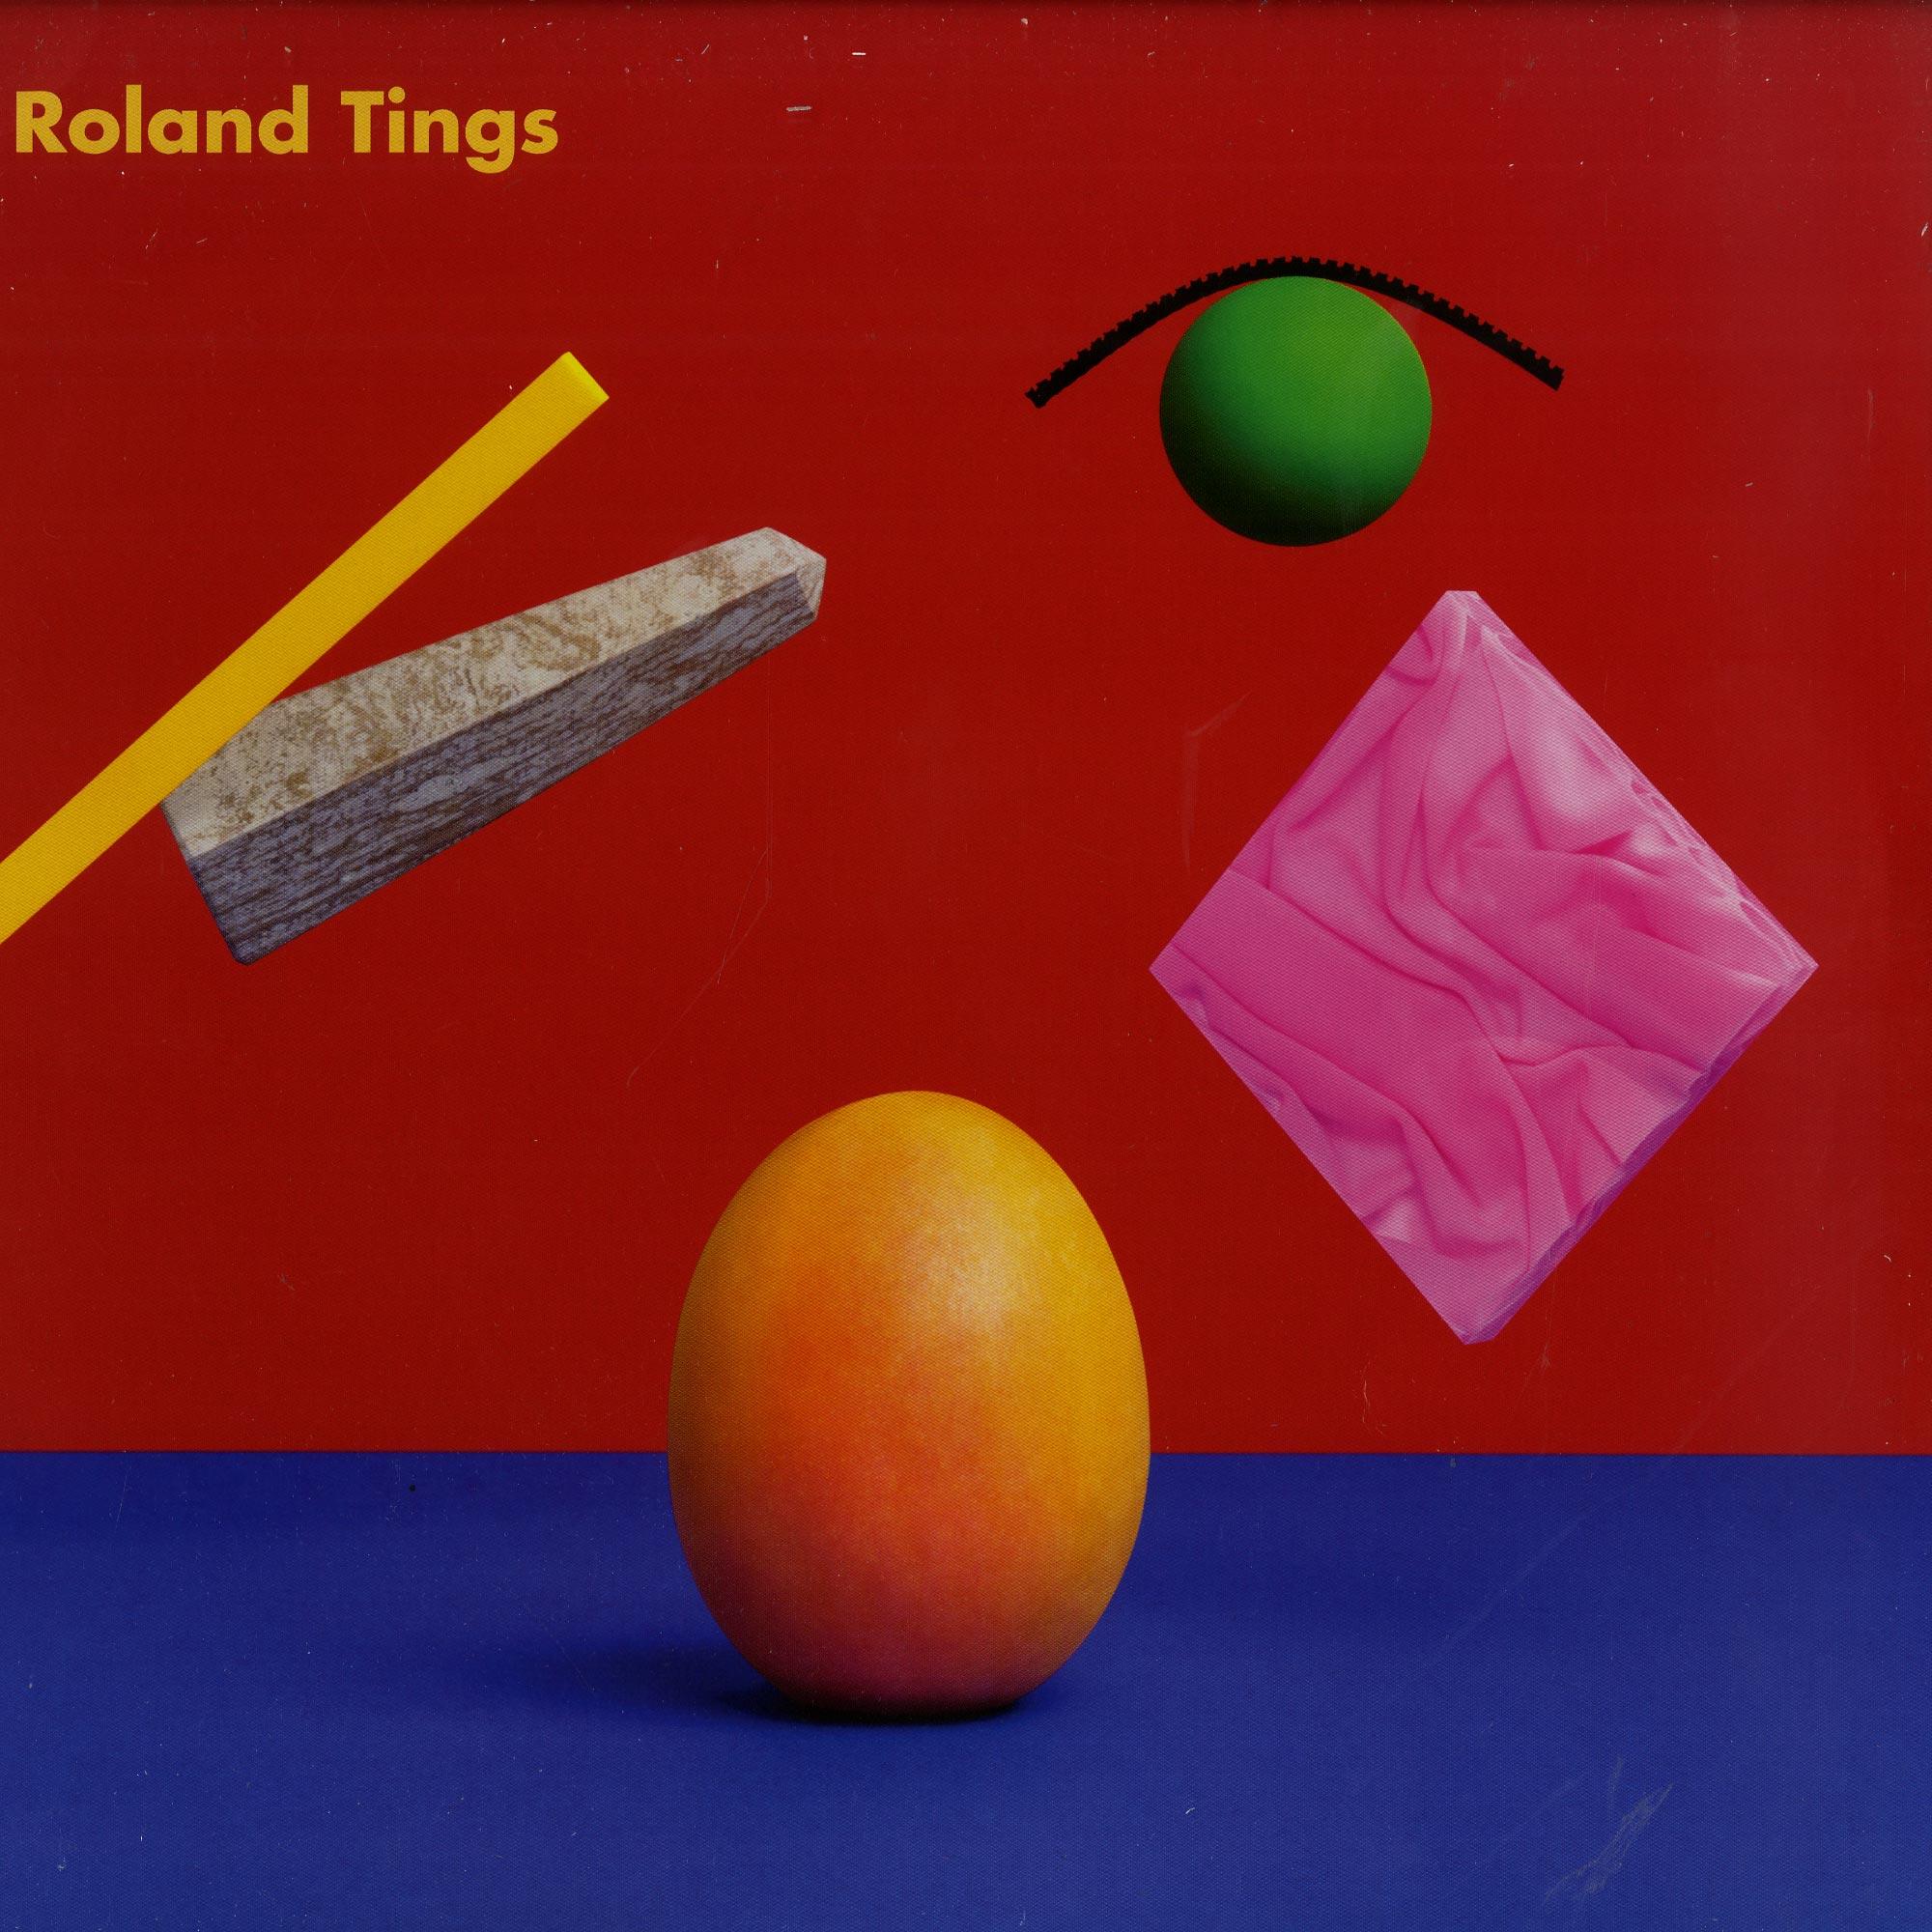 Roland Tings - ROLAND TINGS - THE ALBUM